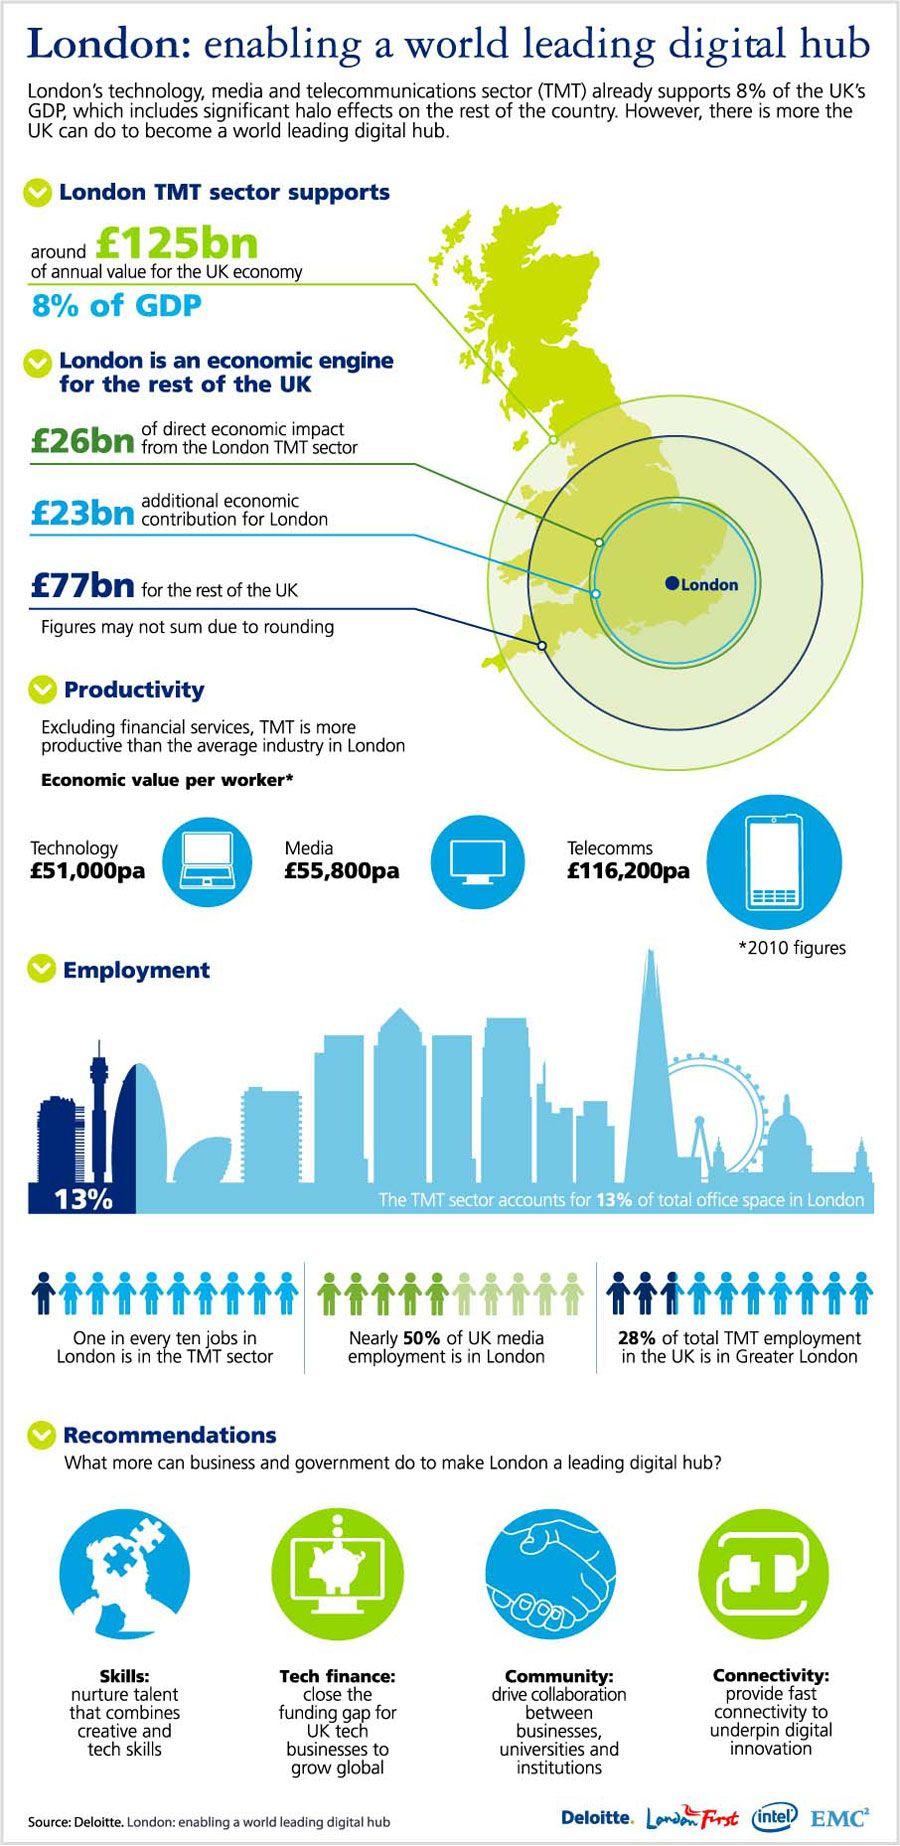 London Enabling a world leading digital hub [Infographic